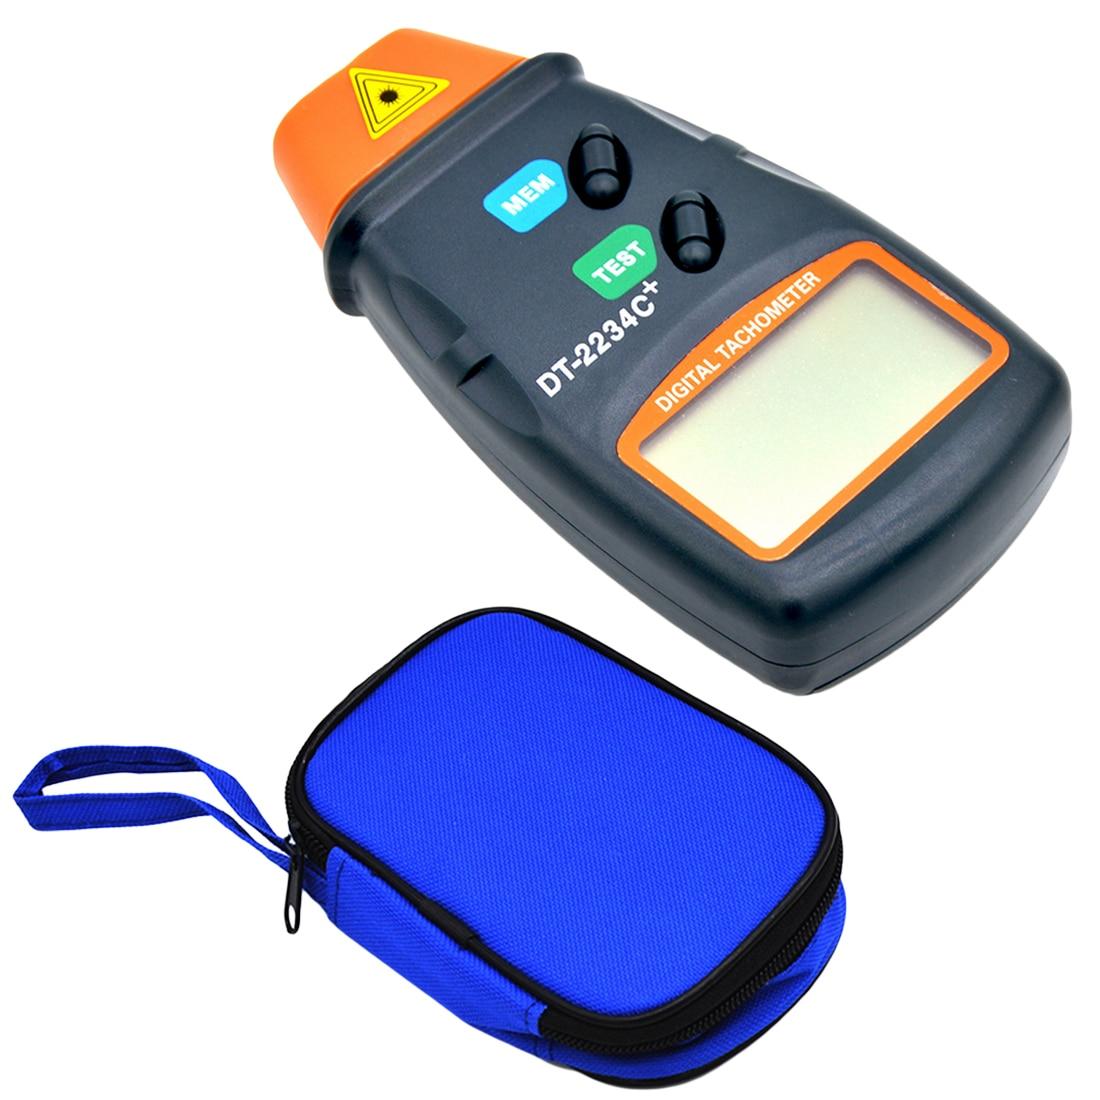 Laser Tachometer Non Contact Tach Tool Handheld Digital Laser Photo Tachometer Tester RPM Motors DC 9V 2.5RPM -99,999RPM